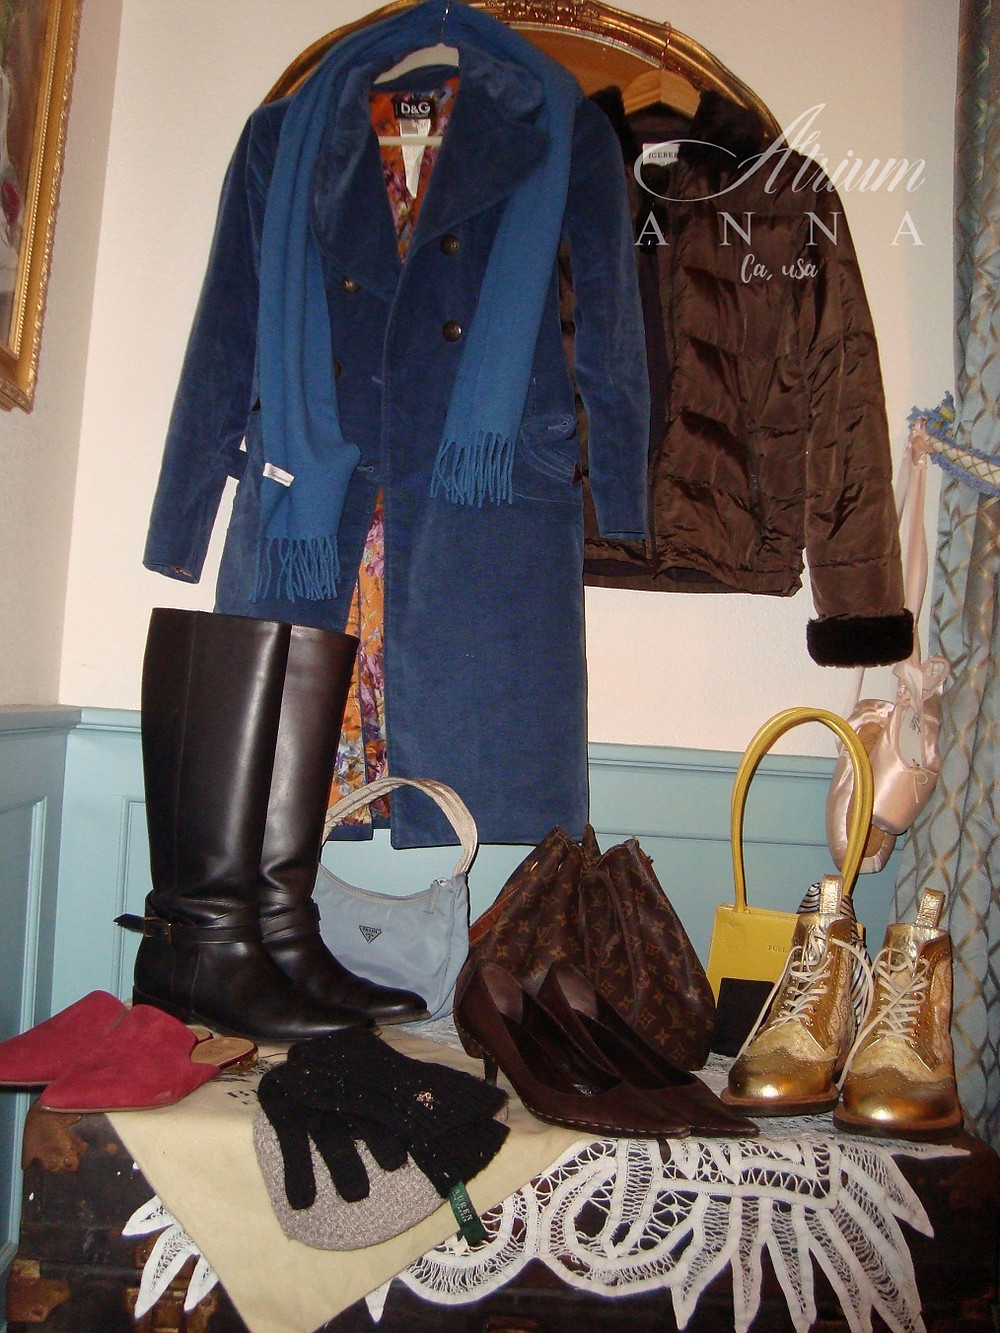 D&G coat, Iceberg down jacket, Prada small purse, Furla clutch purse, LV bucket bag, Blumarine scarfs